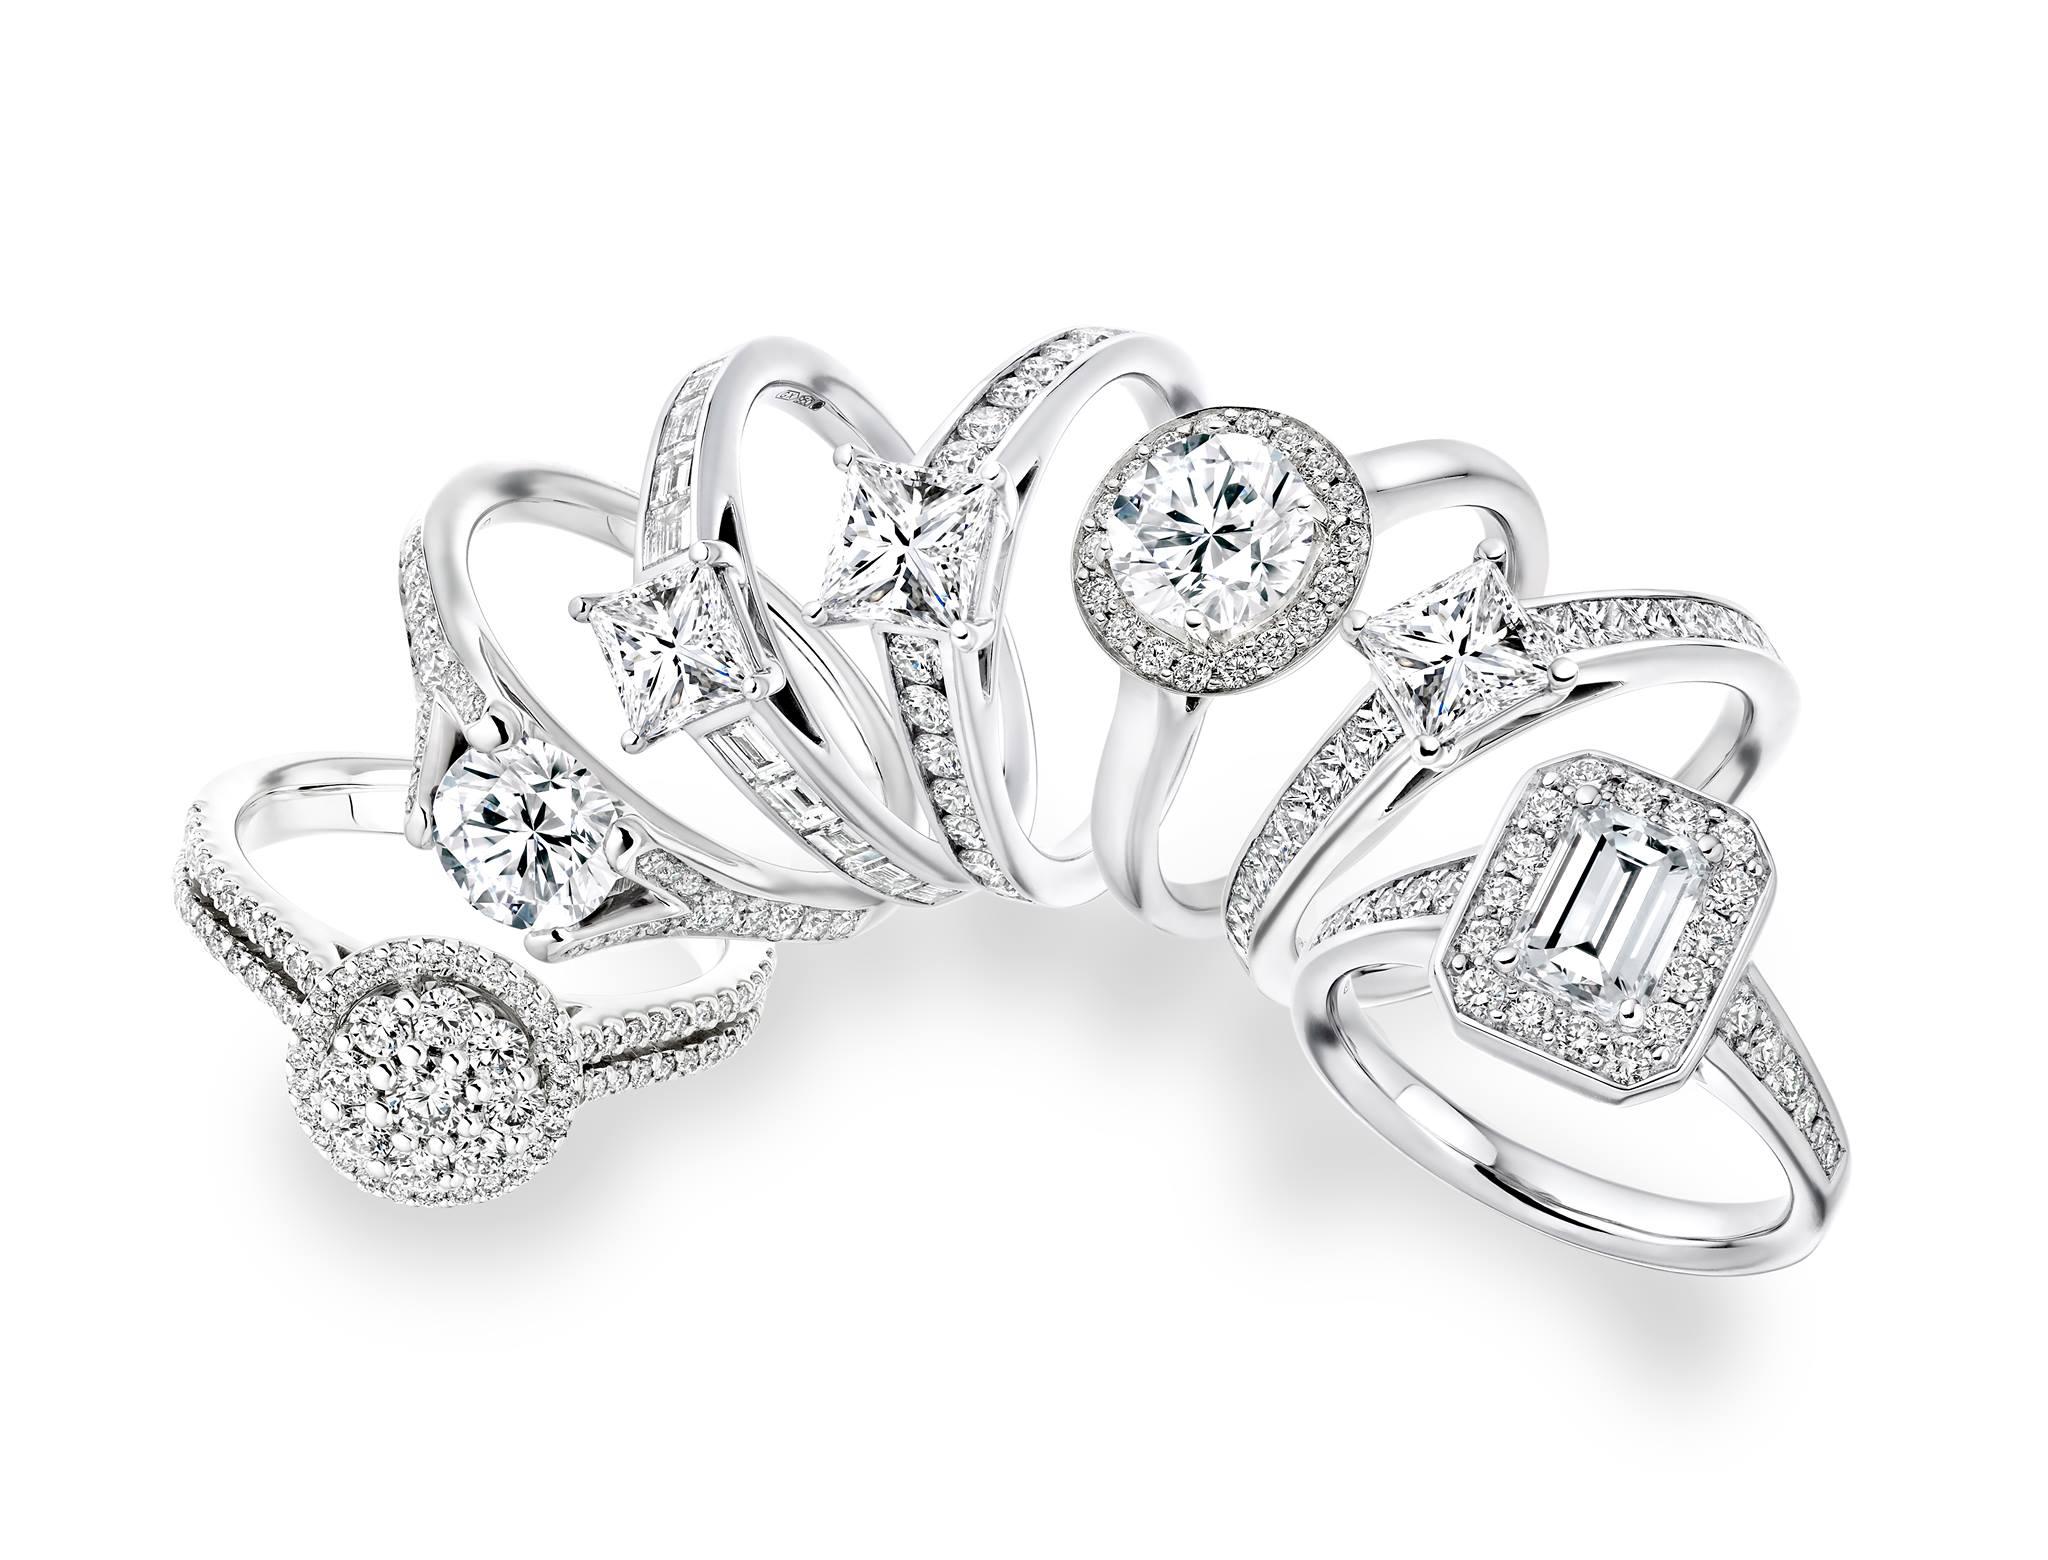 Voltaire Diamonds – Diamond Specialists